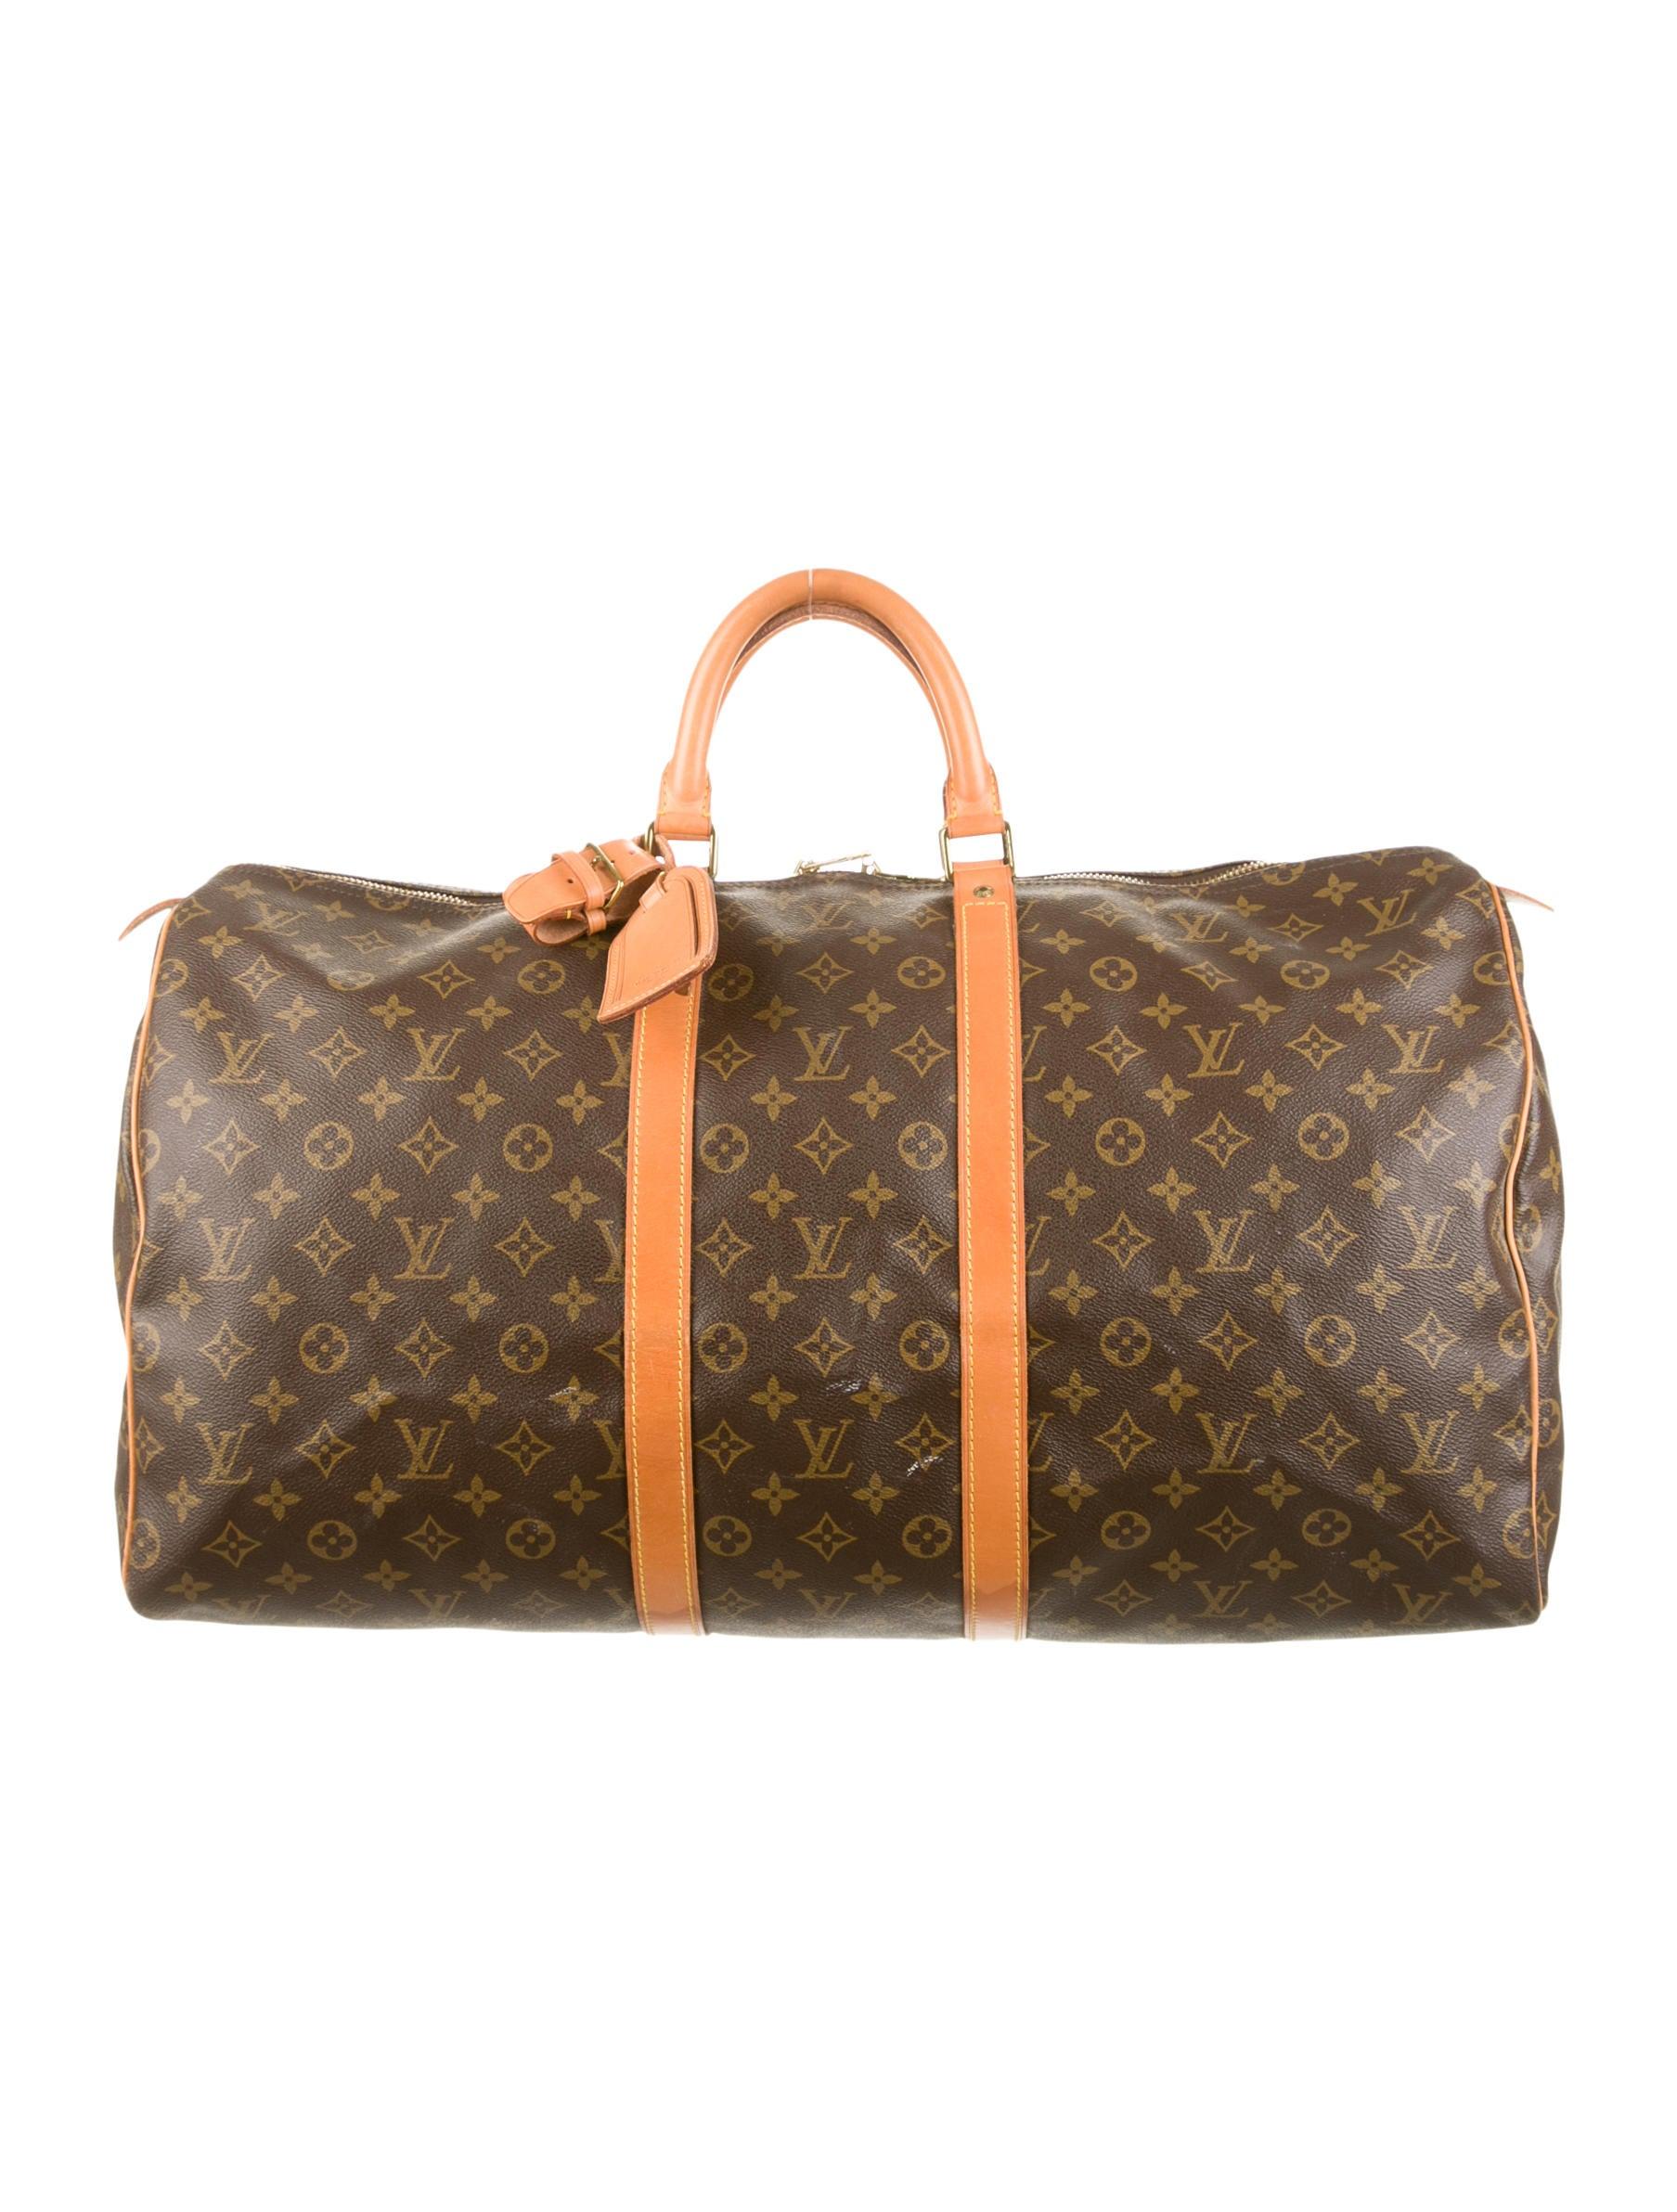 louis vuitton keepall 55 handbags lou52512 the realreal. Black Bedroom Furniture Sets. Home Design Ideas